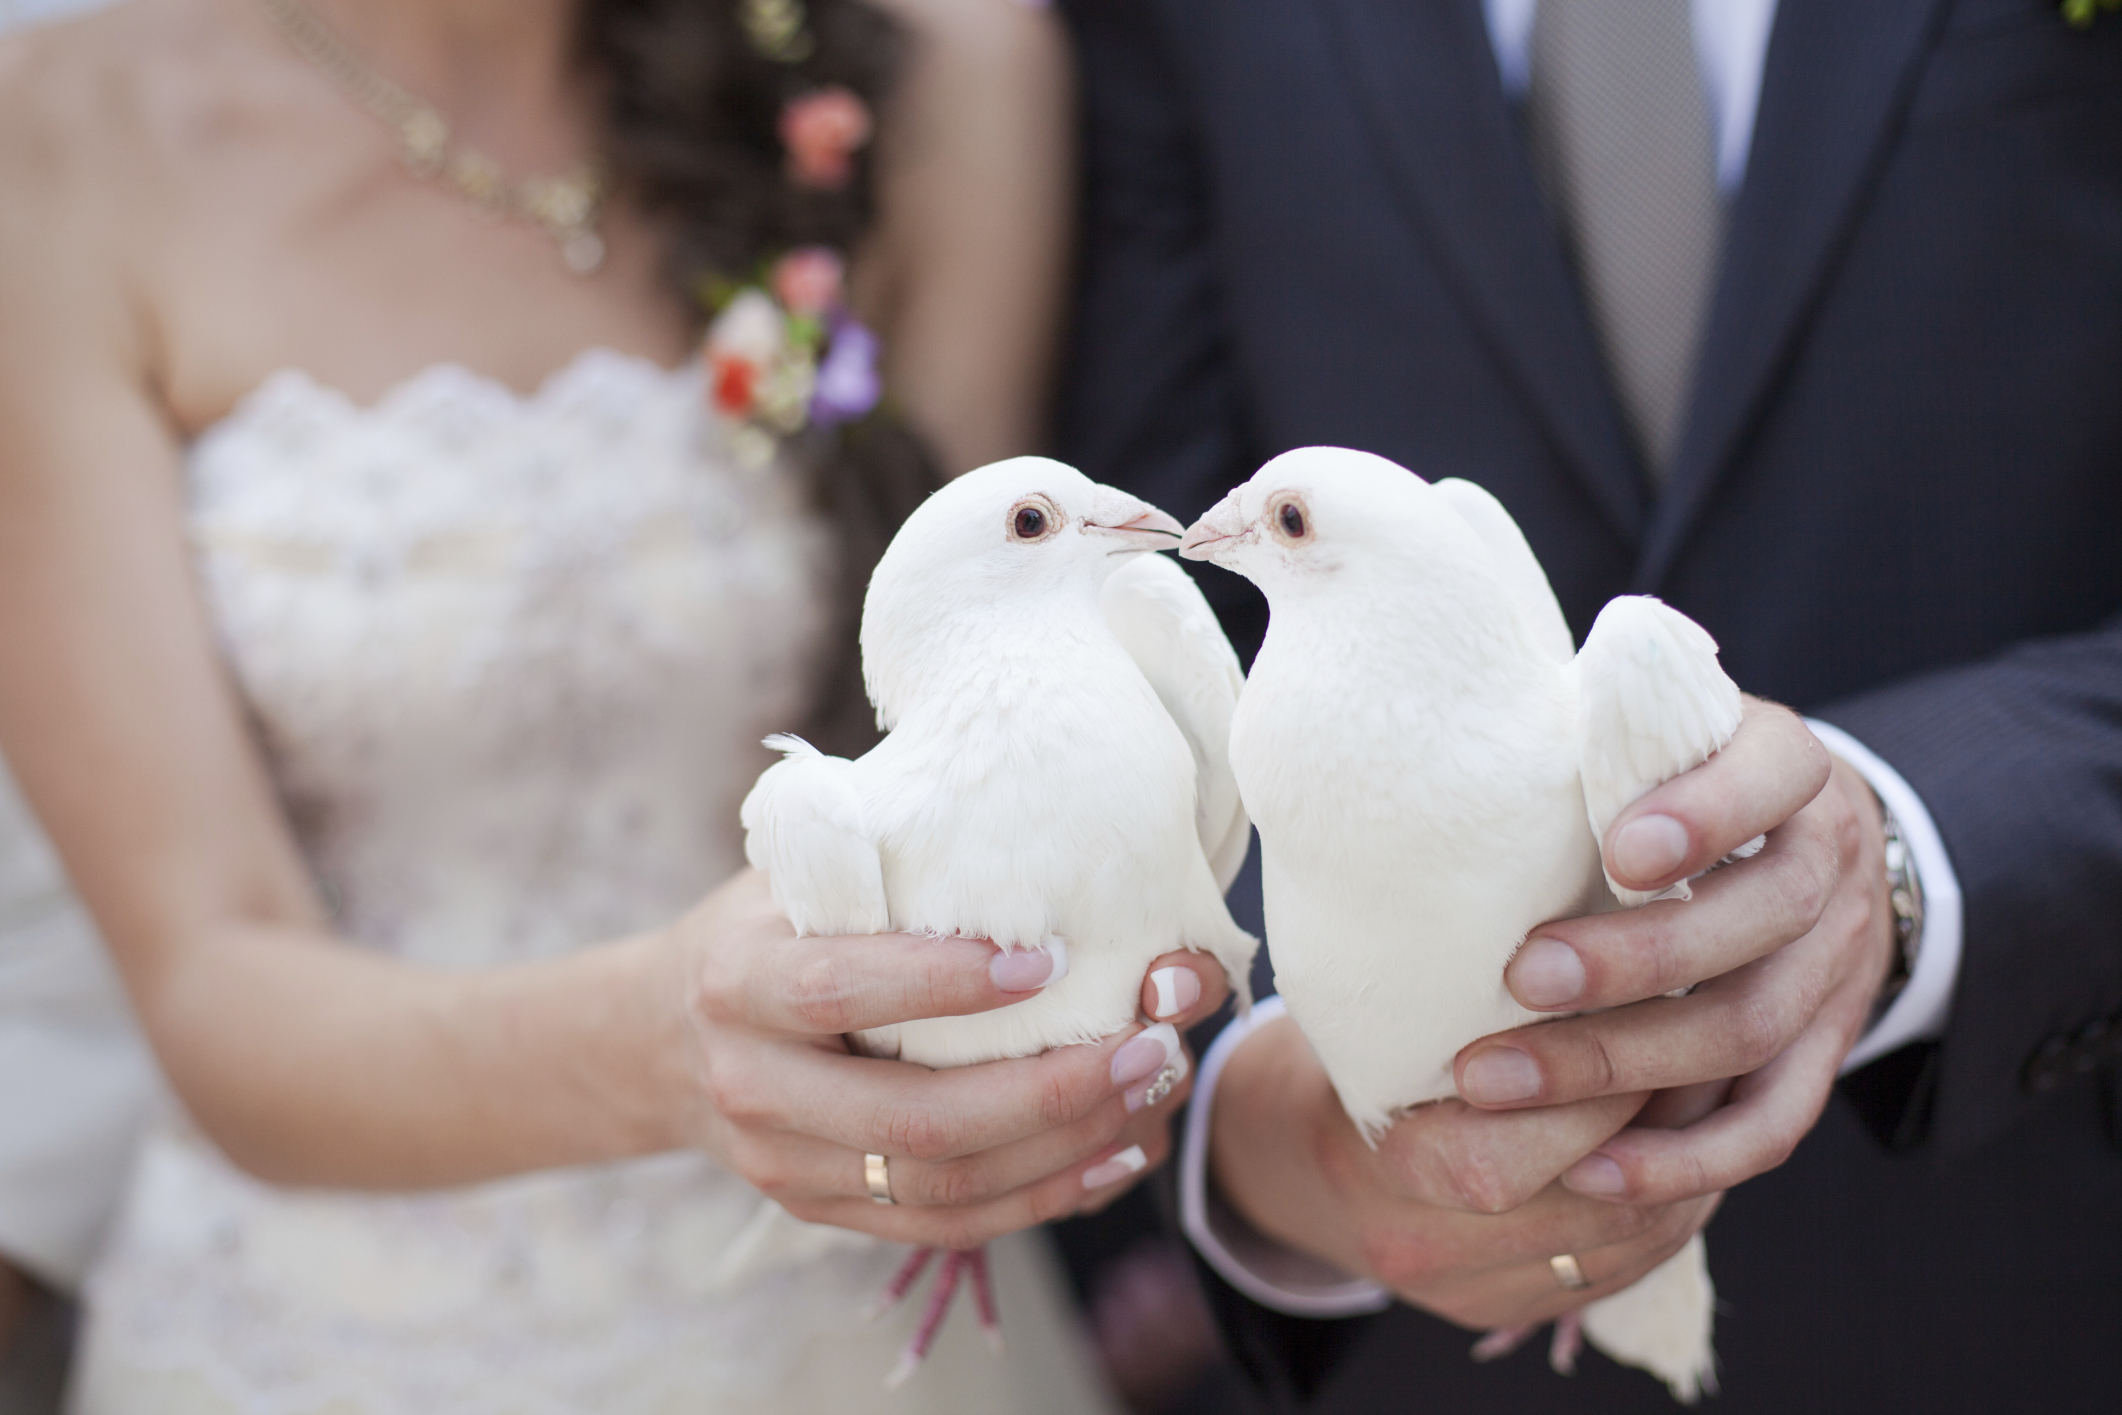 185811394 - Wedding Ceremony Meaning